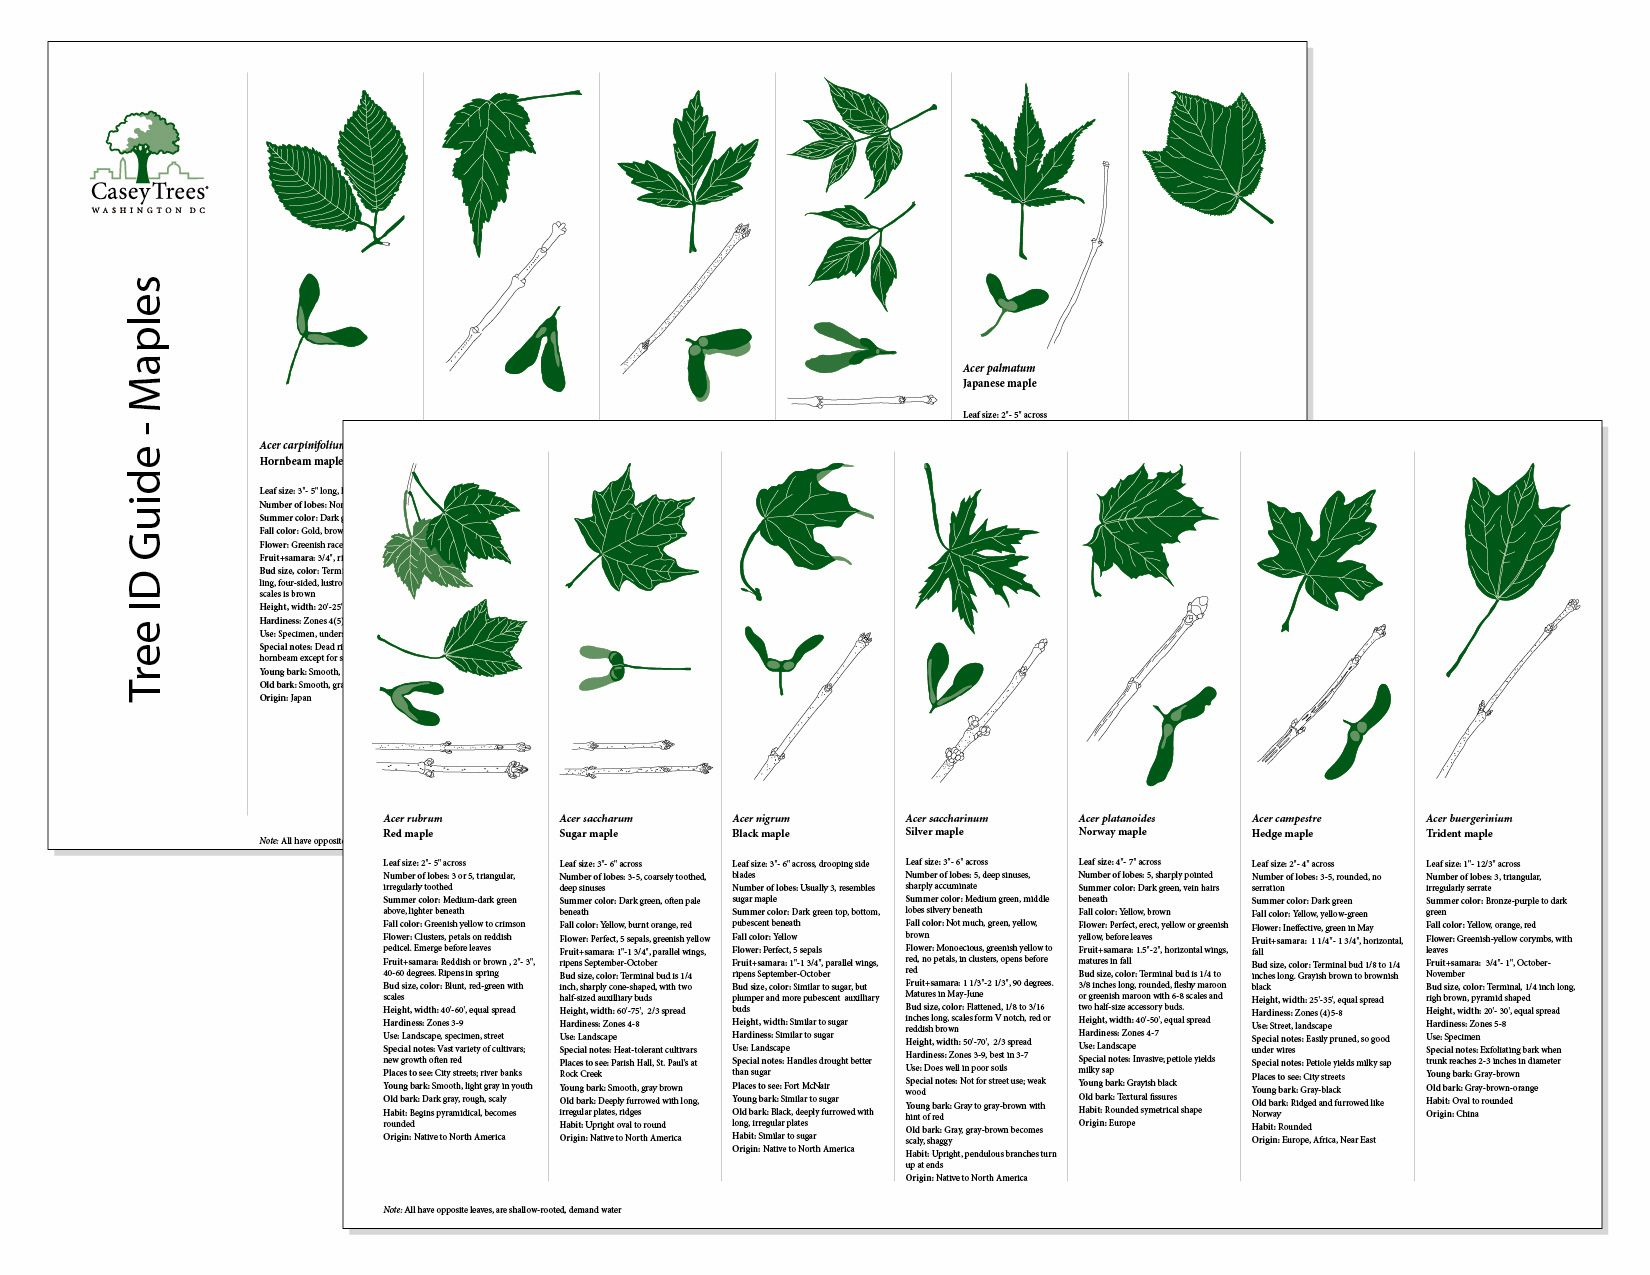 Tree Bark Identification Chart Google Search Arboretum